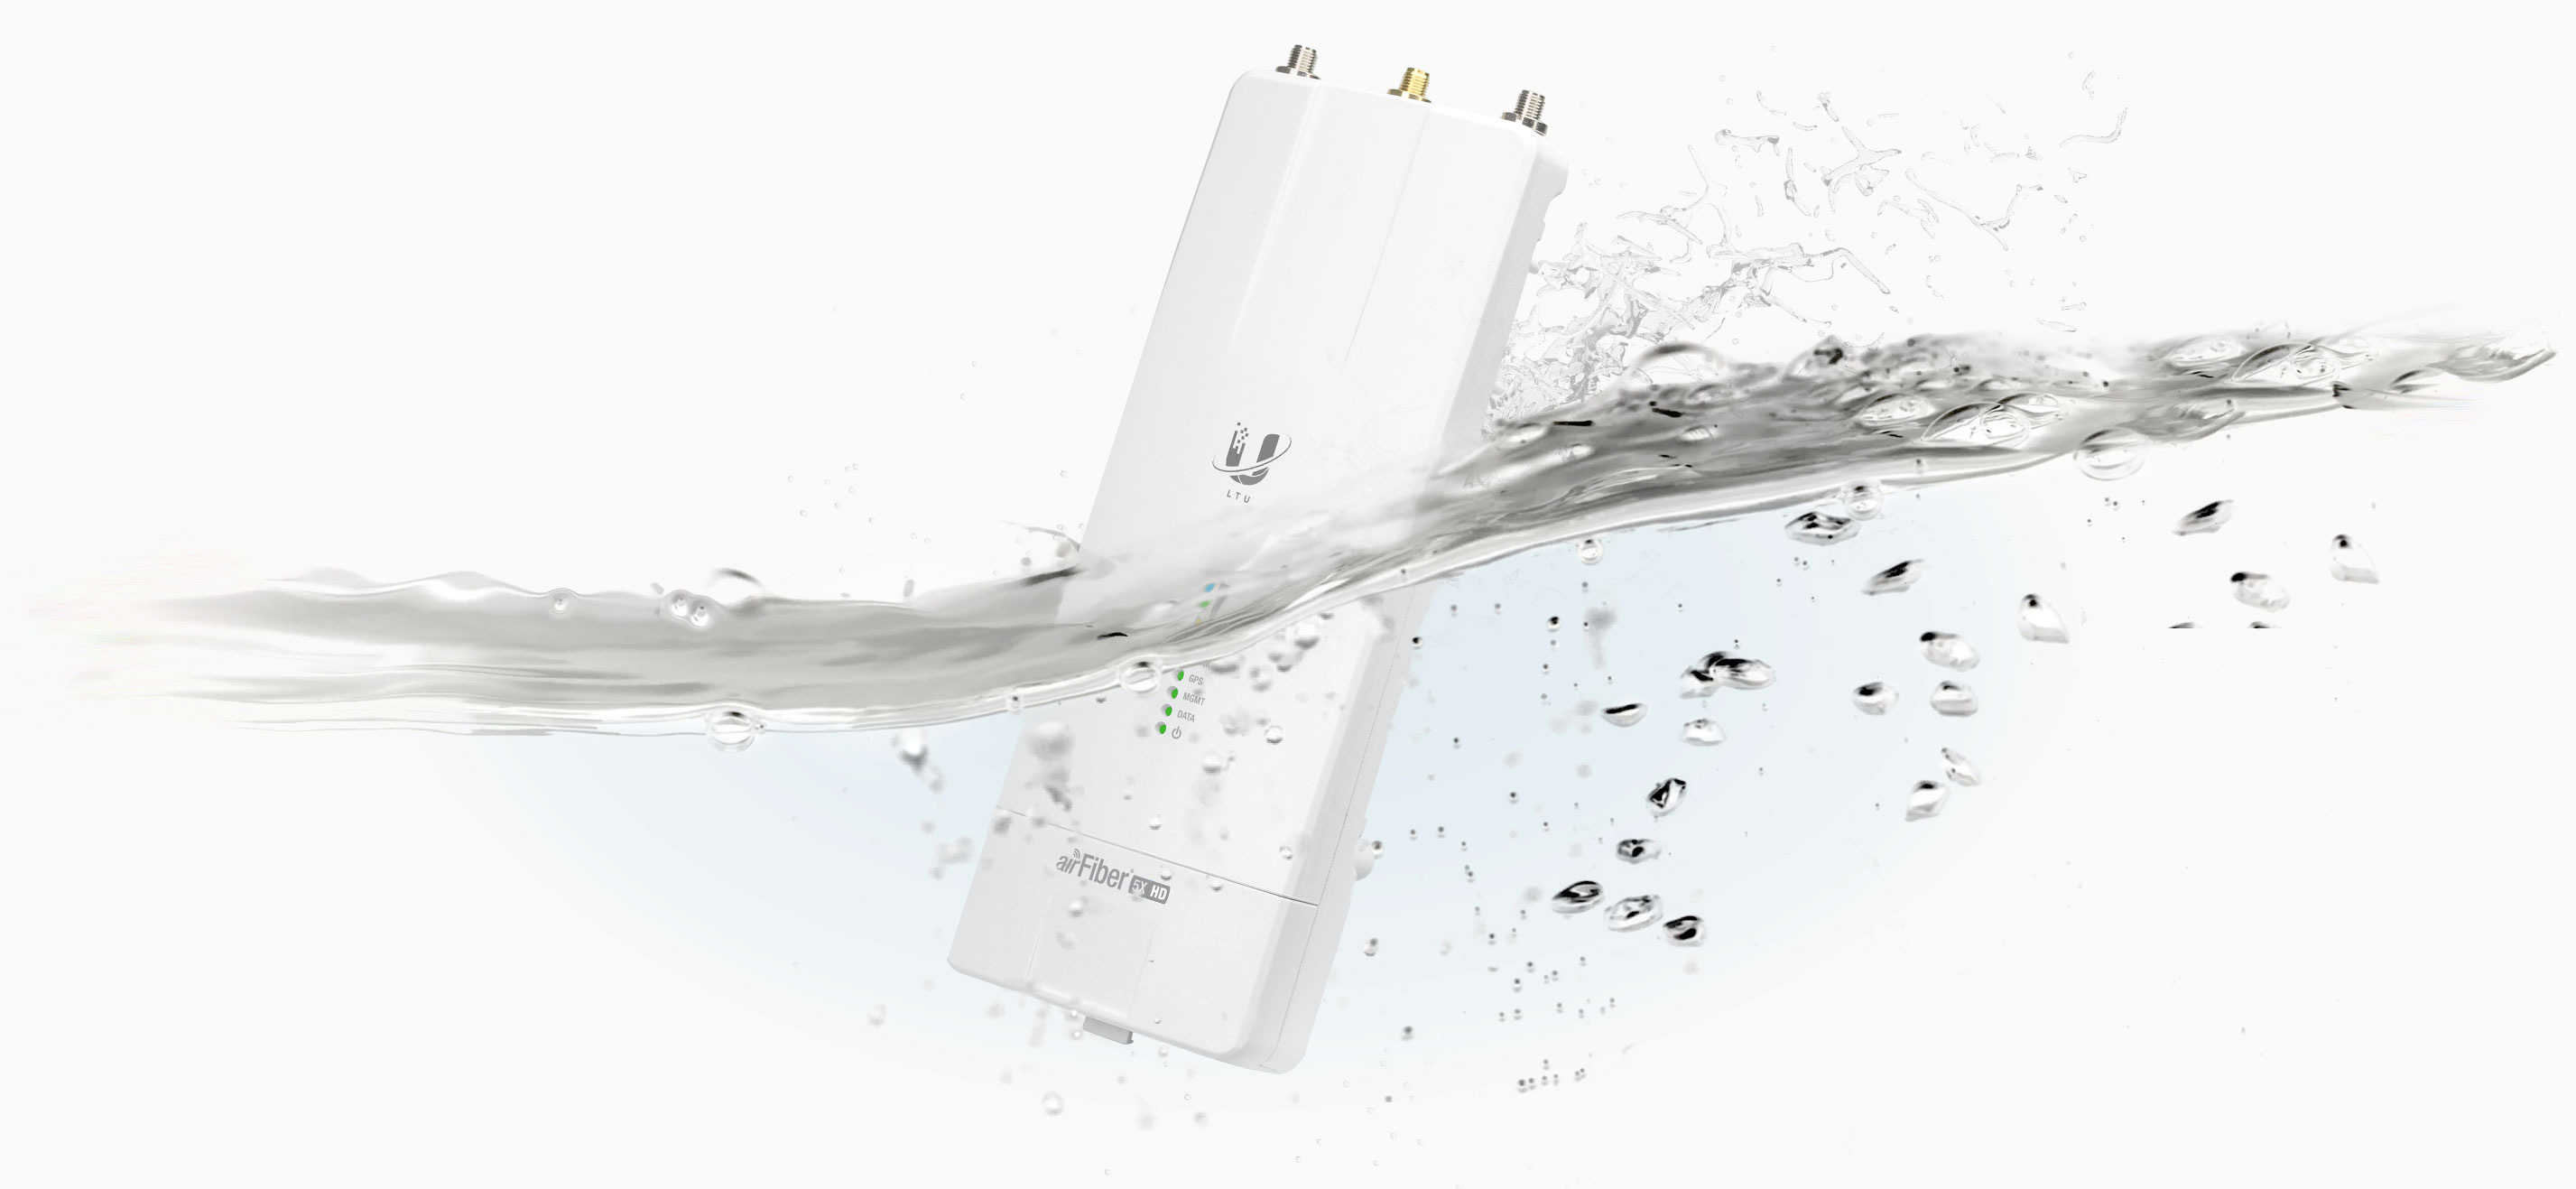 data-interchange=[https://prd-www-cdn.ubnt.com/media/images/product-features/ltu-inwater2.jpg,